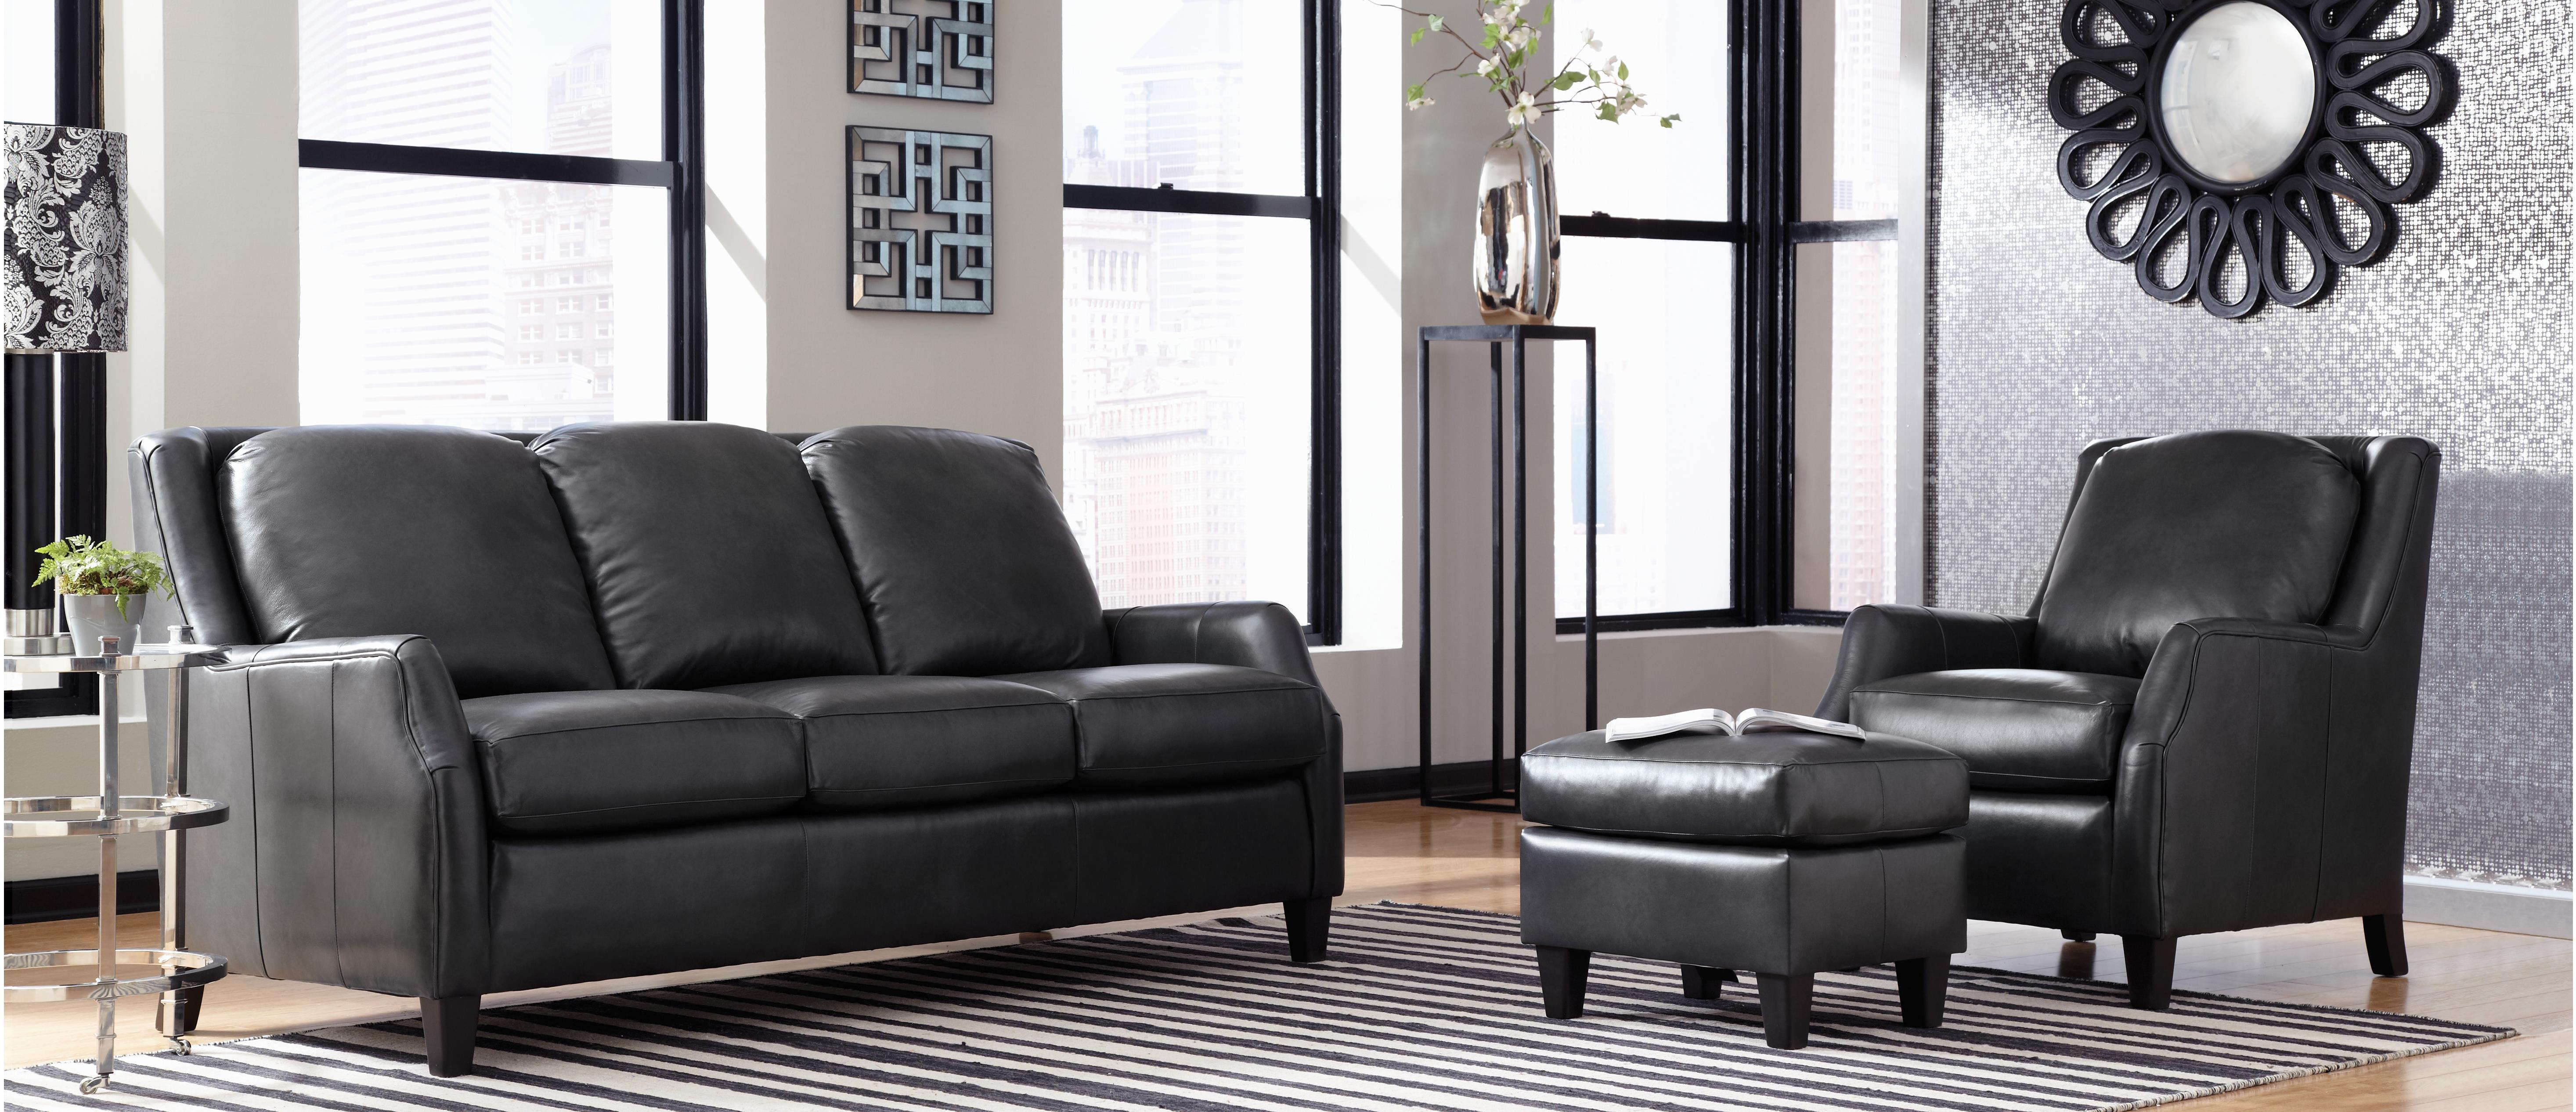 Black Sofa with Chair and Ottoman